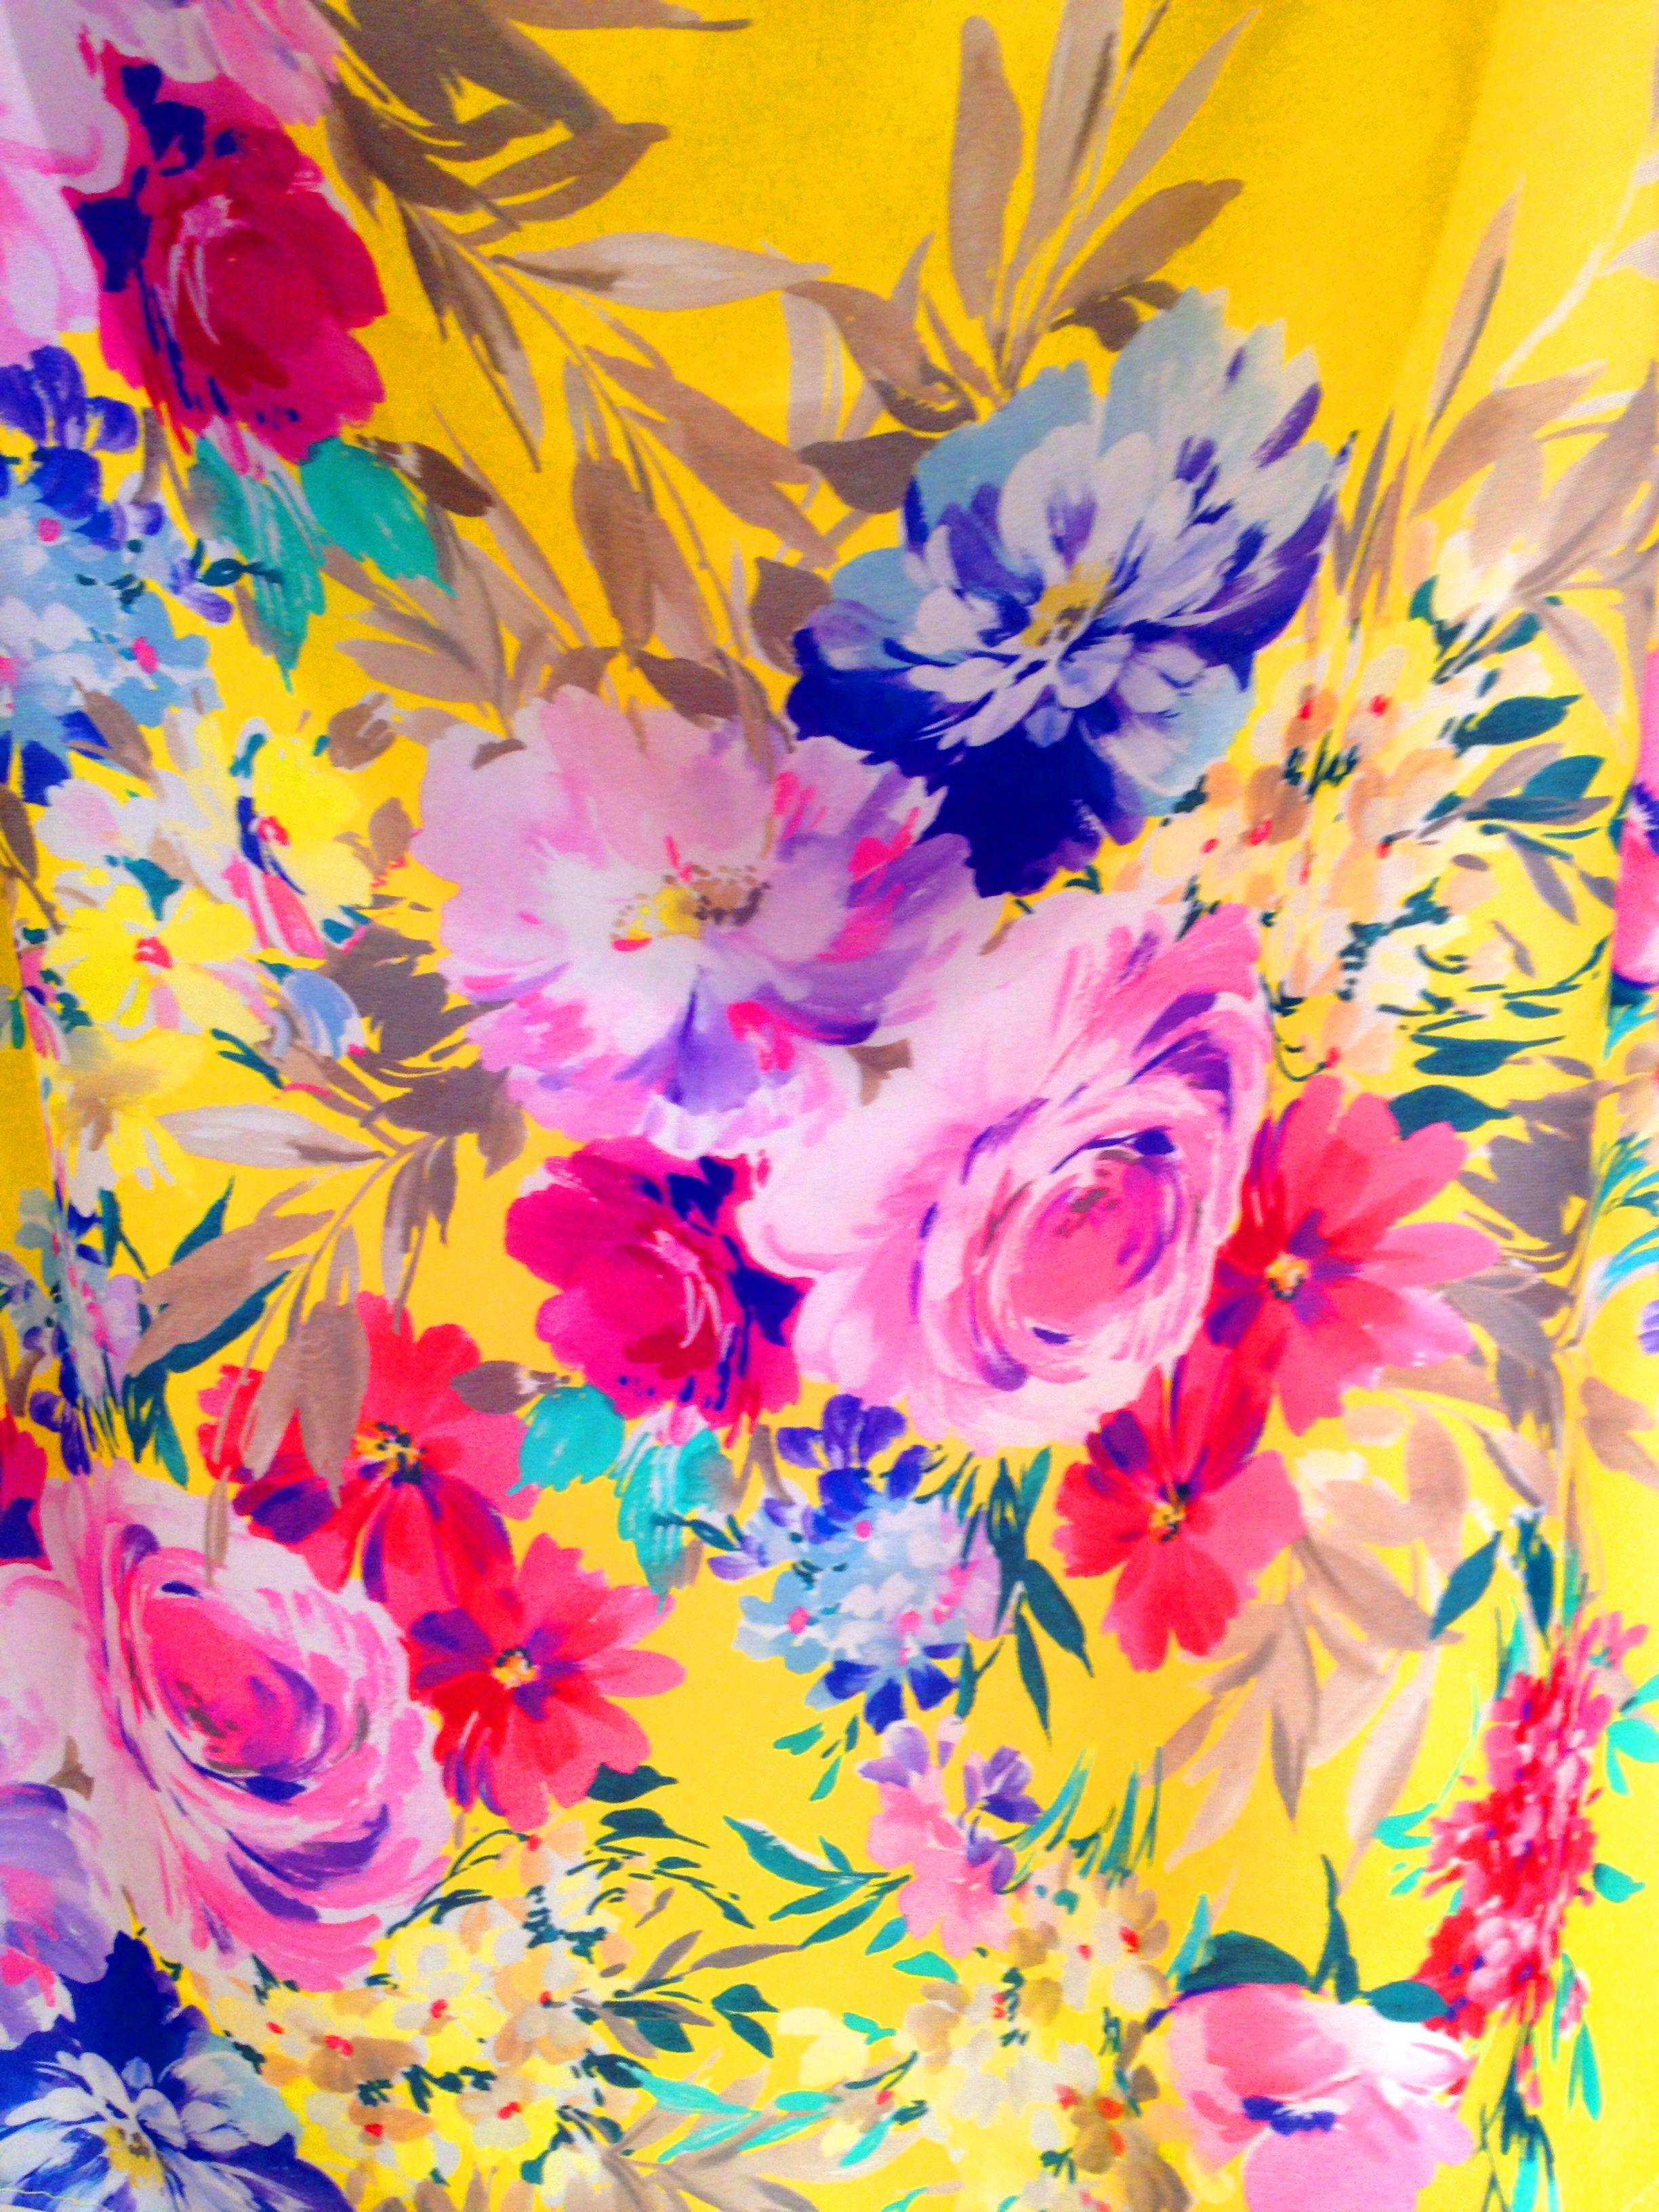 Yellow Ipad Wallpaper Watercolor Hipster Wallpaper Iphone Wallpaper Vintage